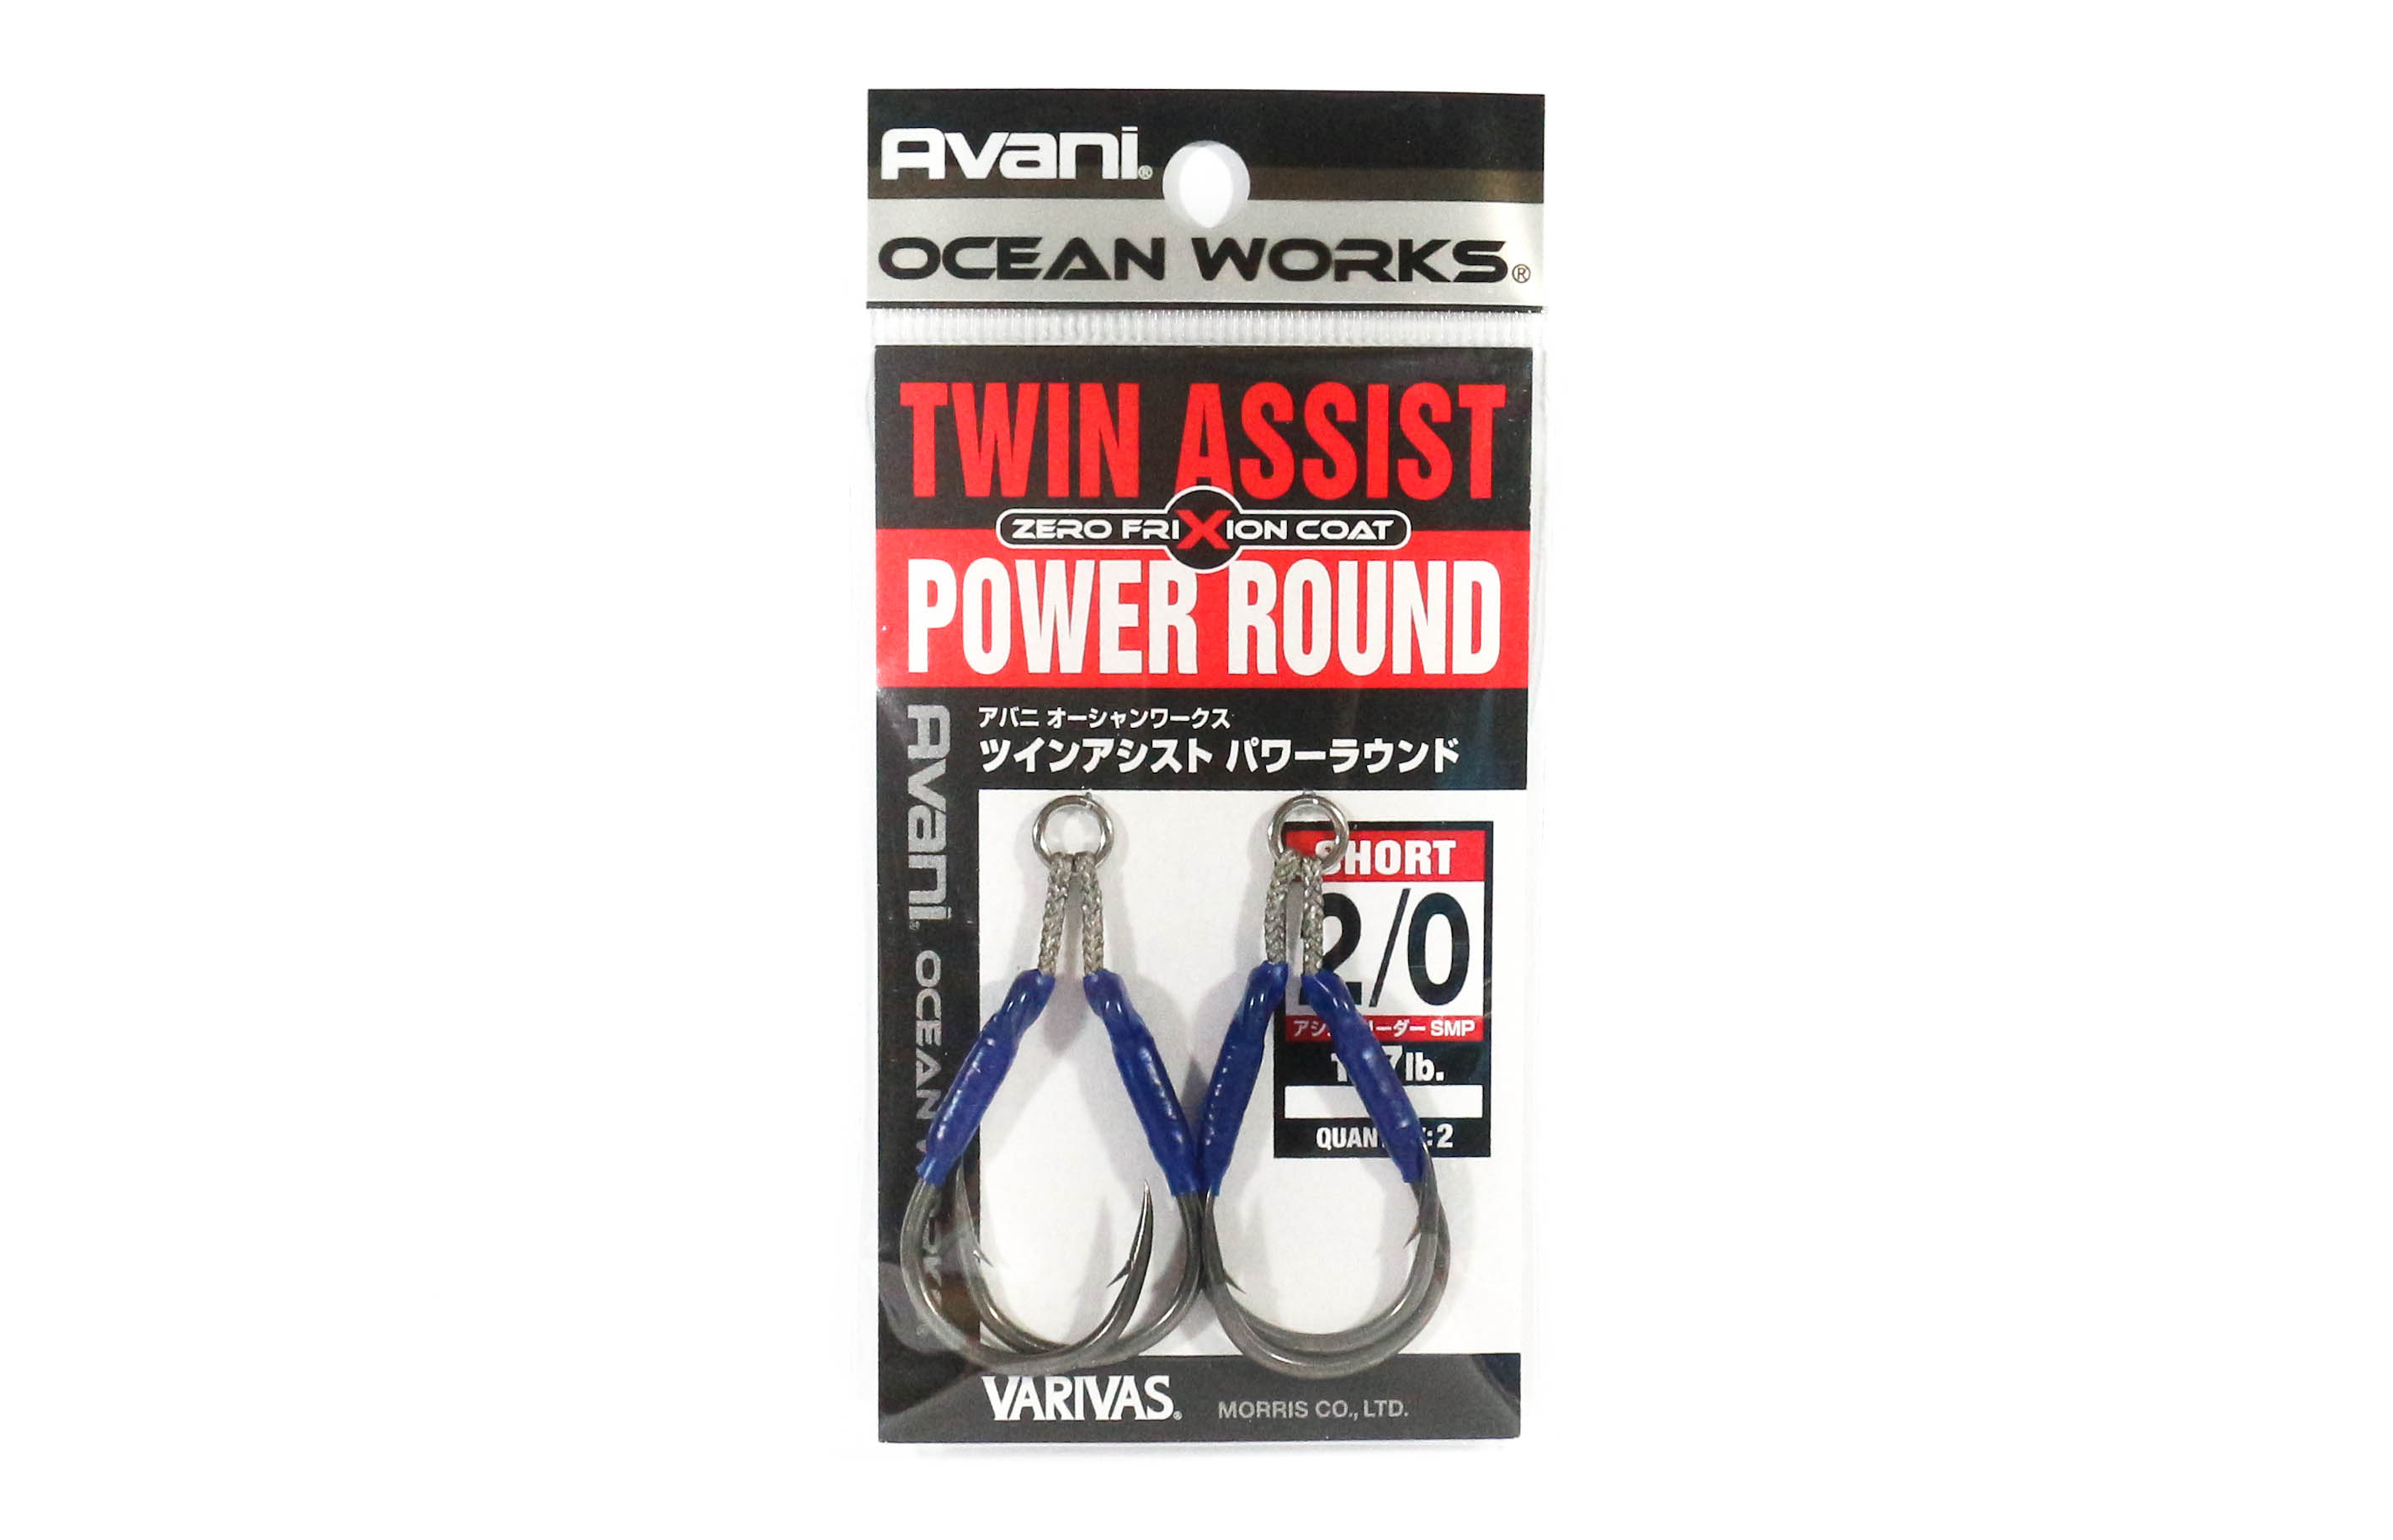 Varivas AH-49 Ocean Works Twin Assist Power Round Short Size 2/0 (4421)